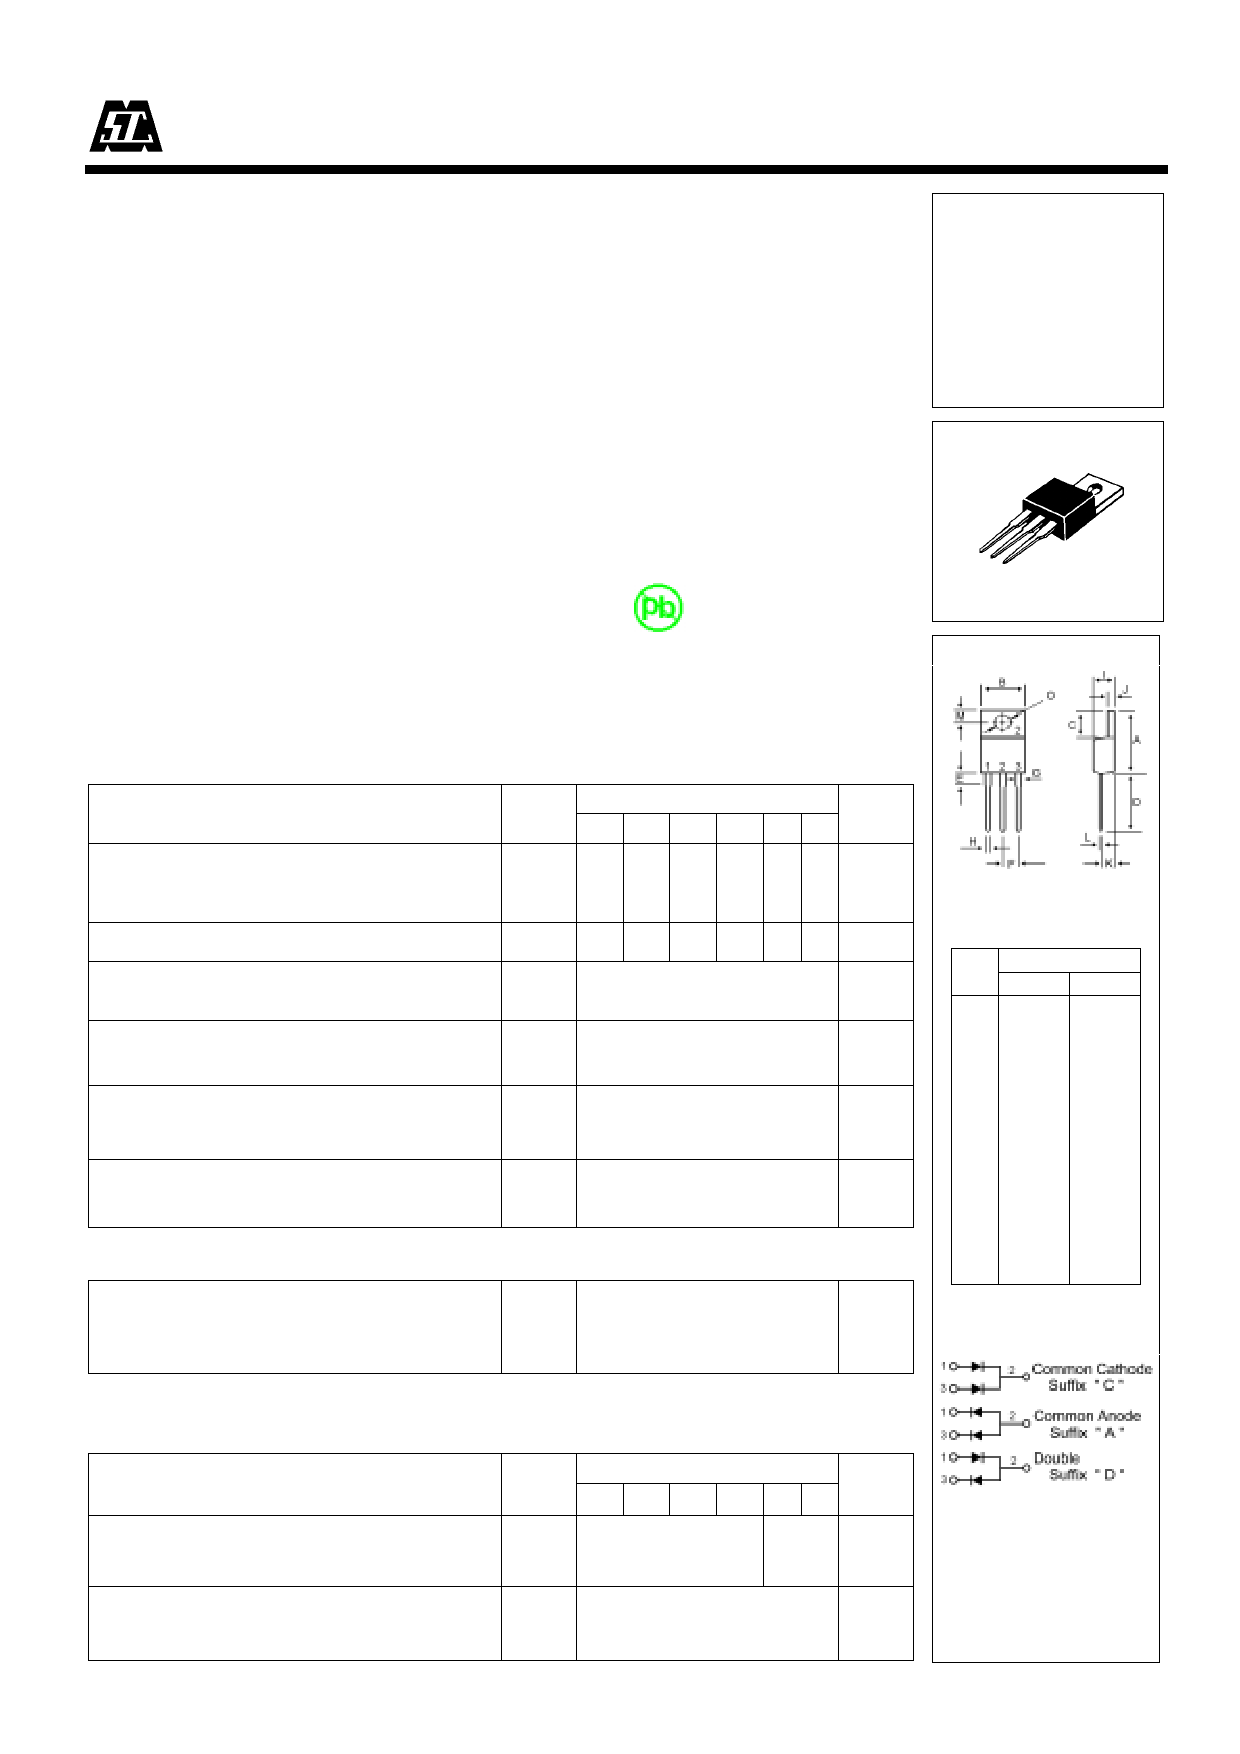 S20C45 datasheet pinout